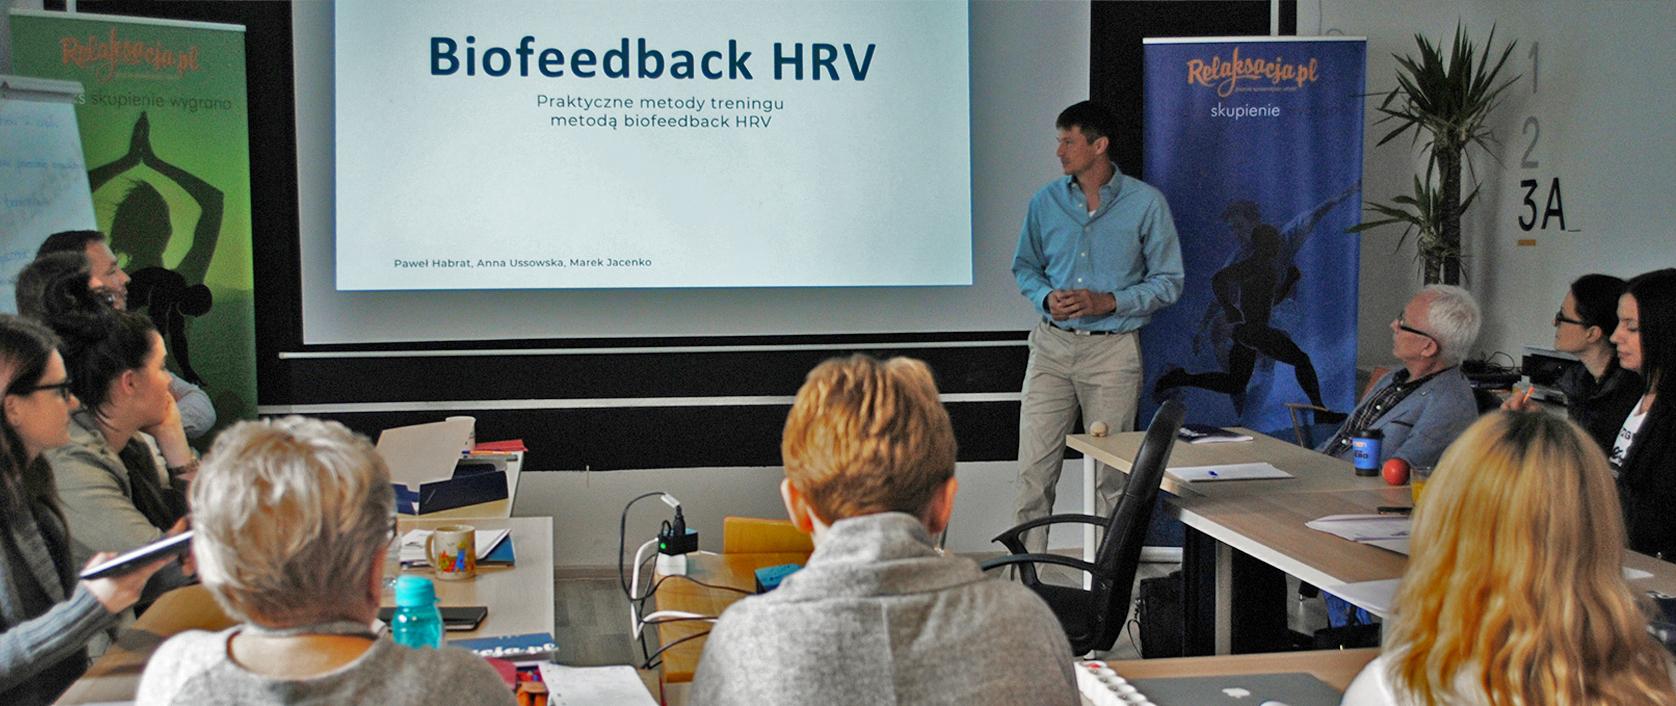 Marek Jacenko: Szkolenie biofeedback HRV